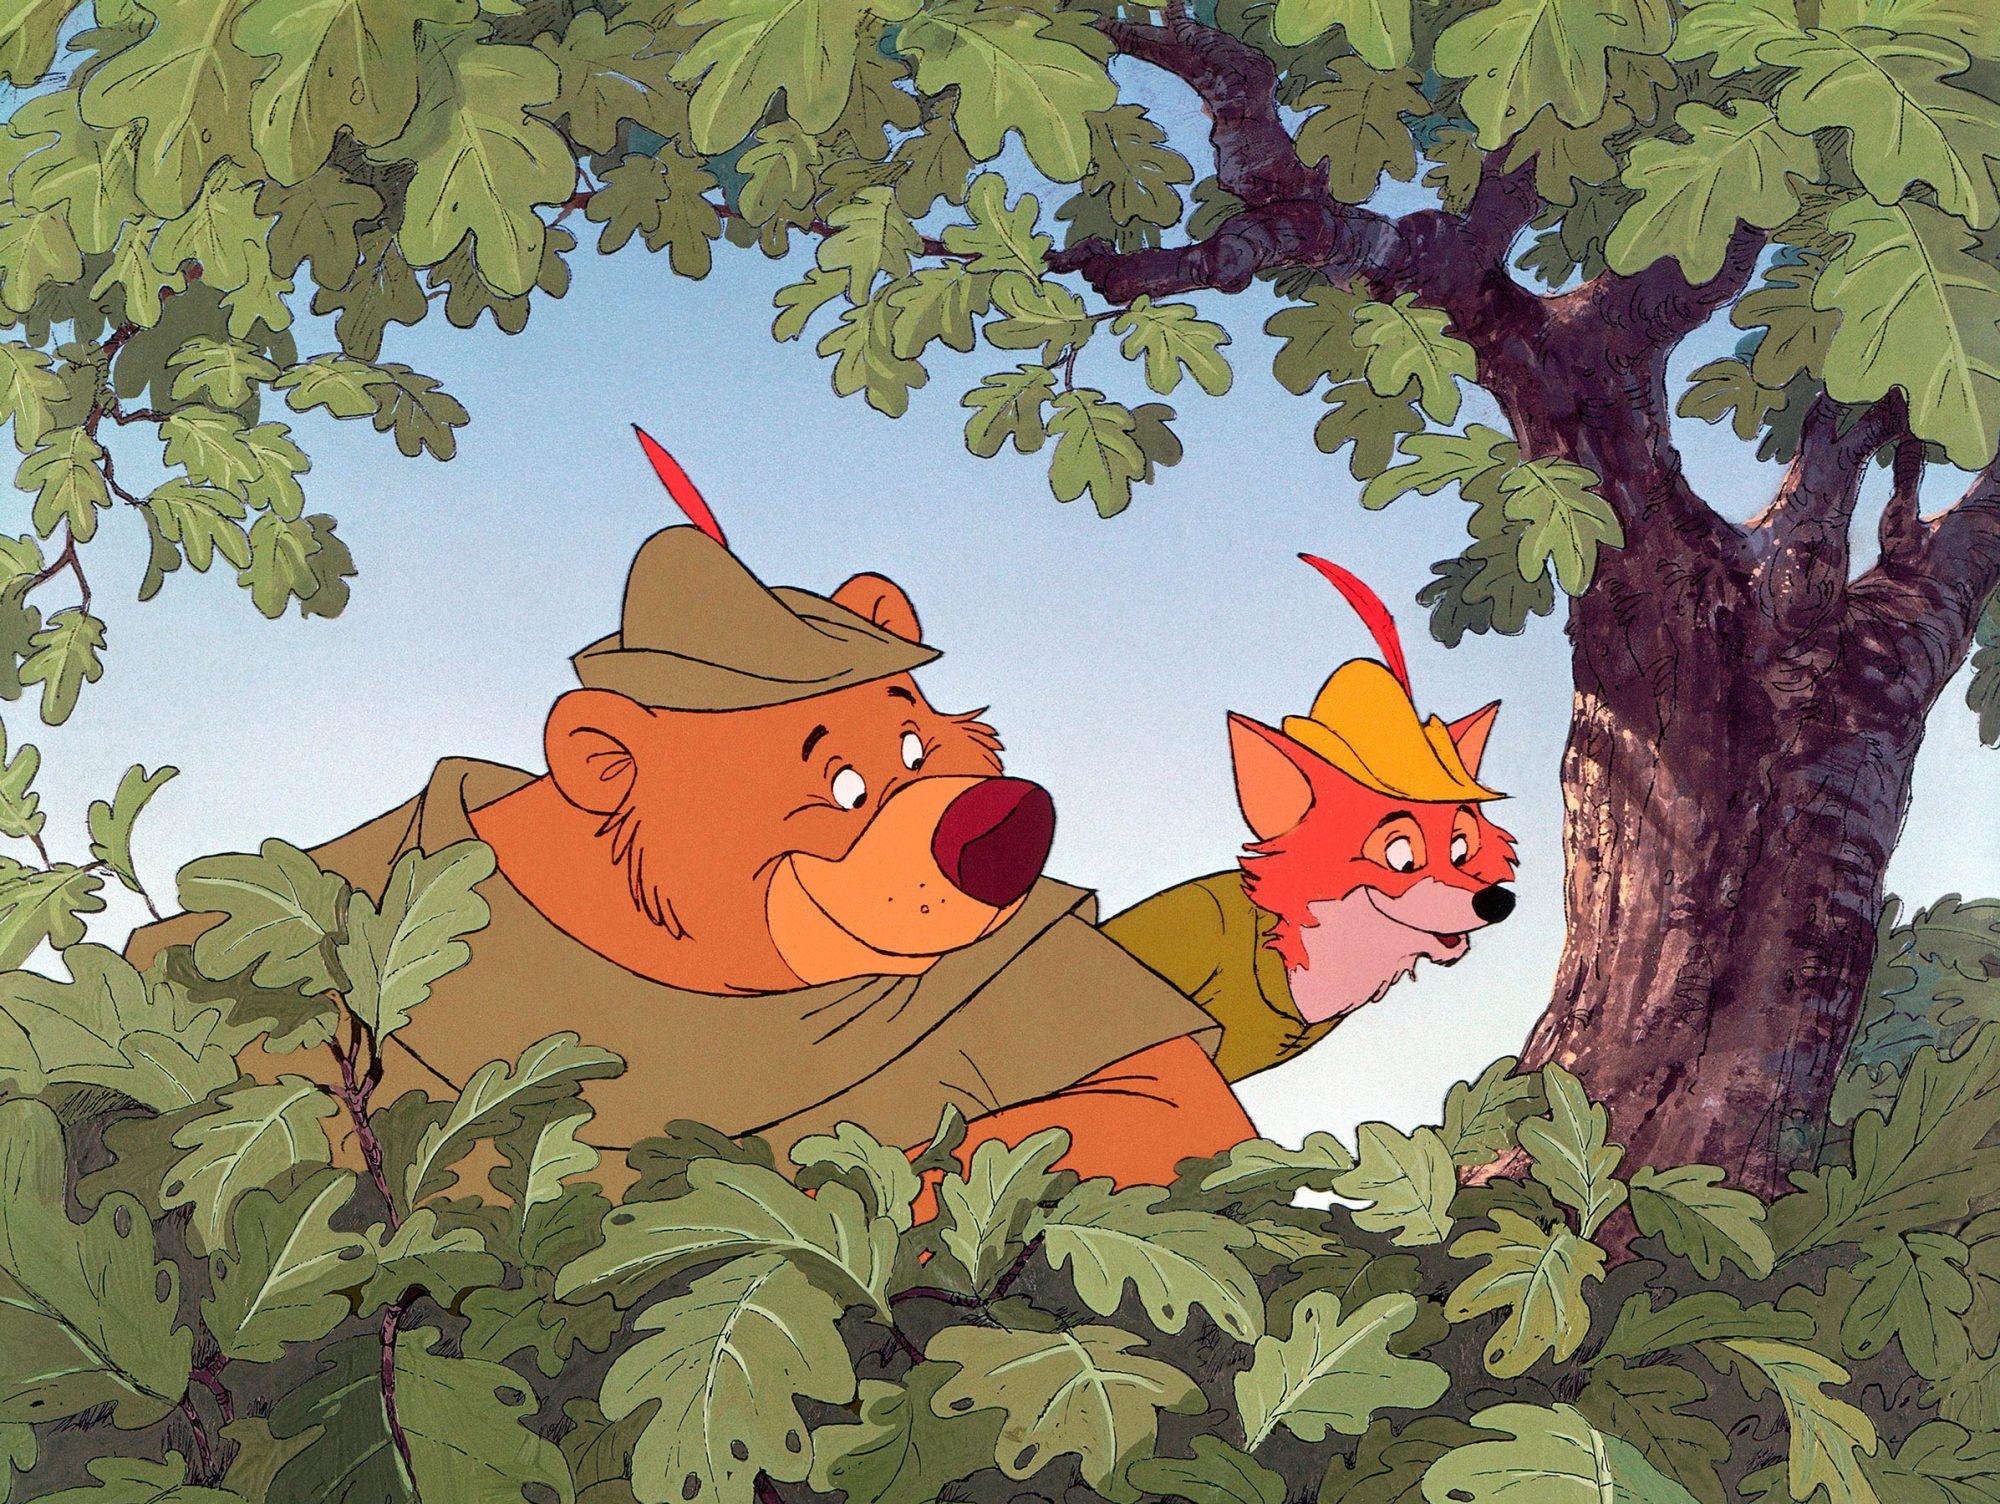 ROBIN HOOD, Little John, Robin Hood, 1973